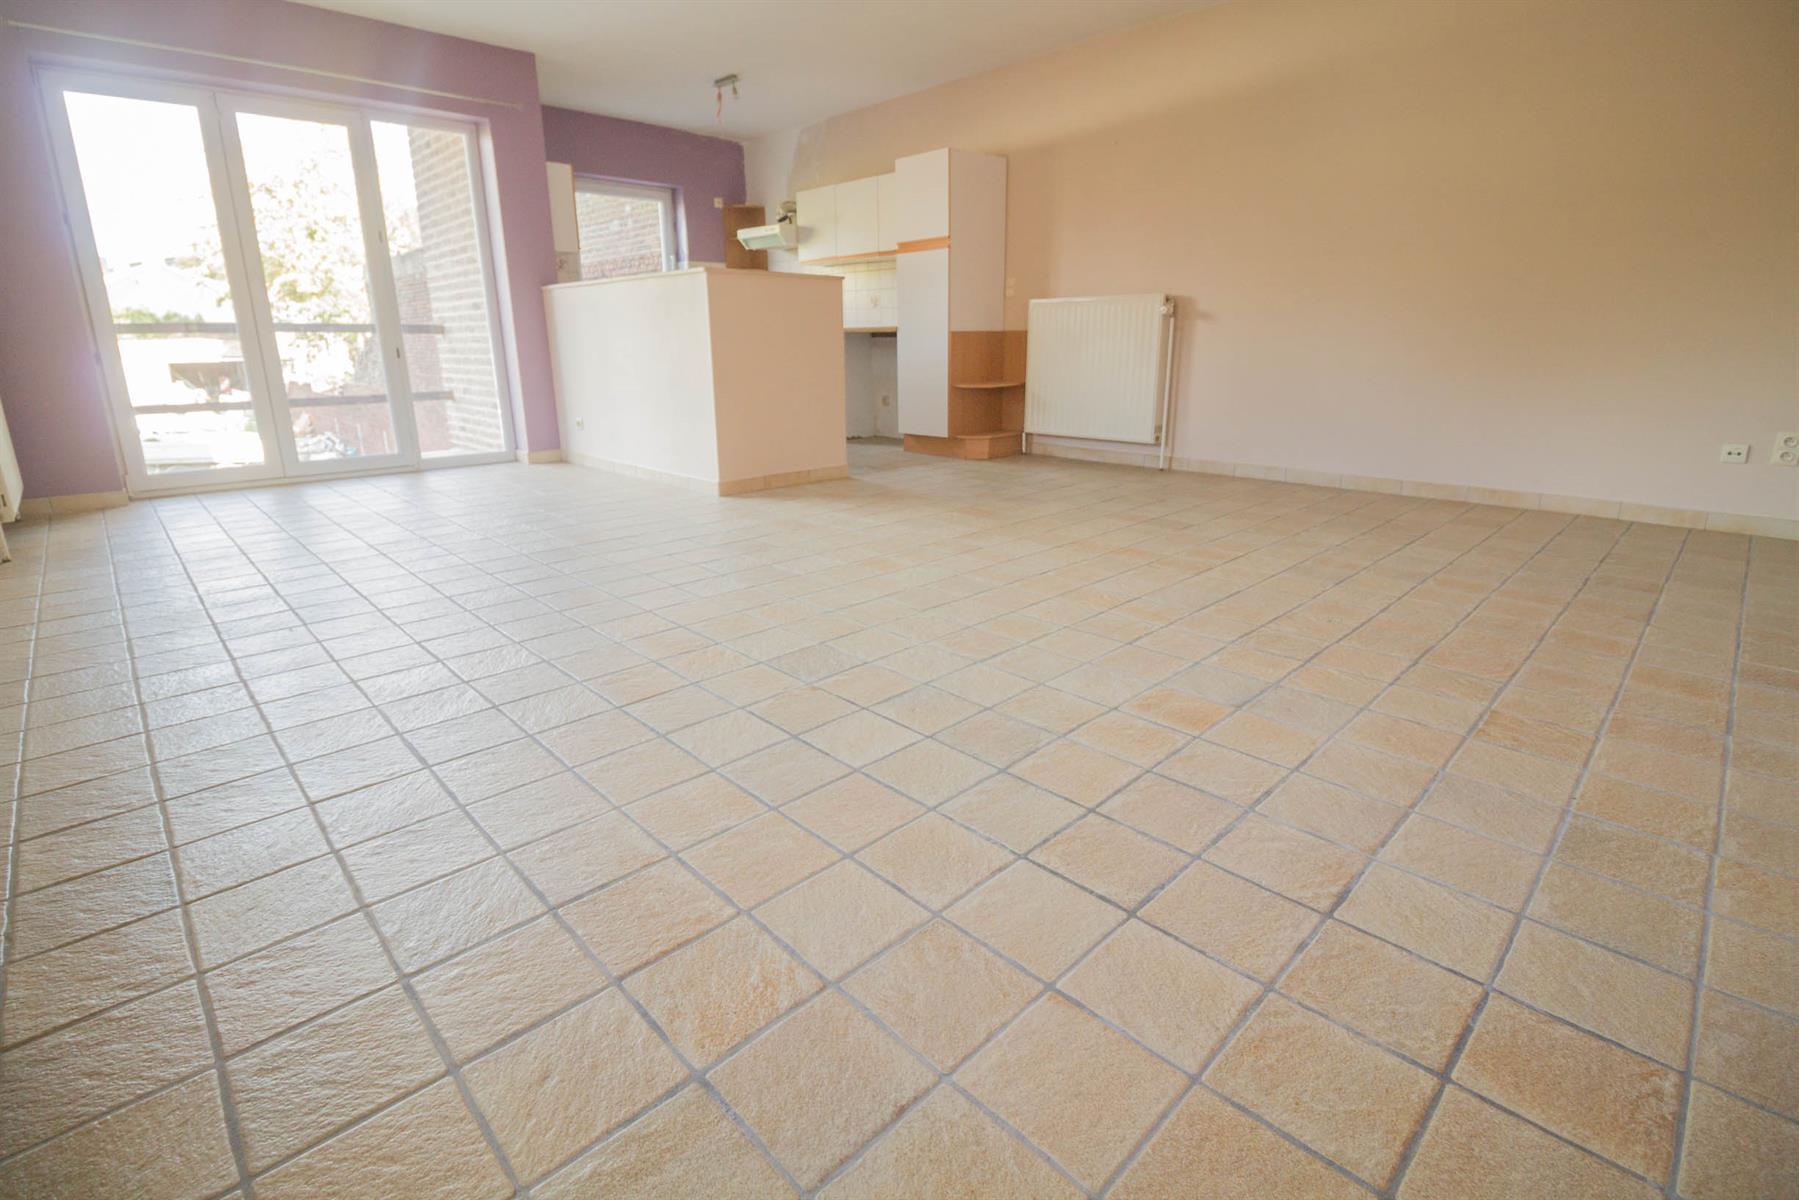 Appartement - Courcelles - #4226901-6